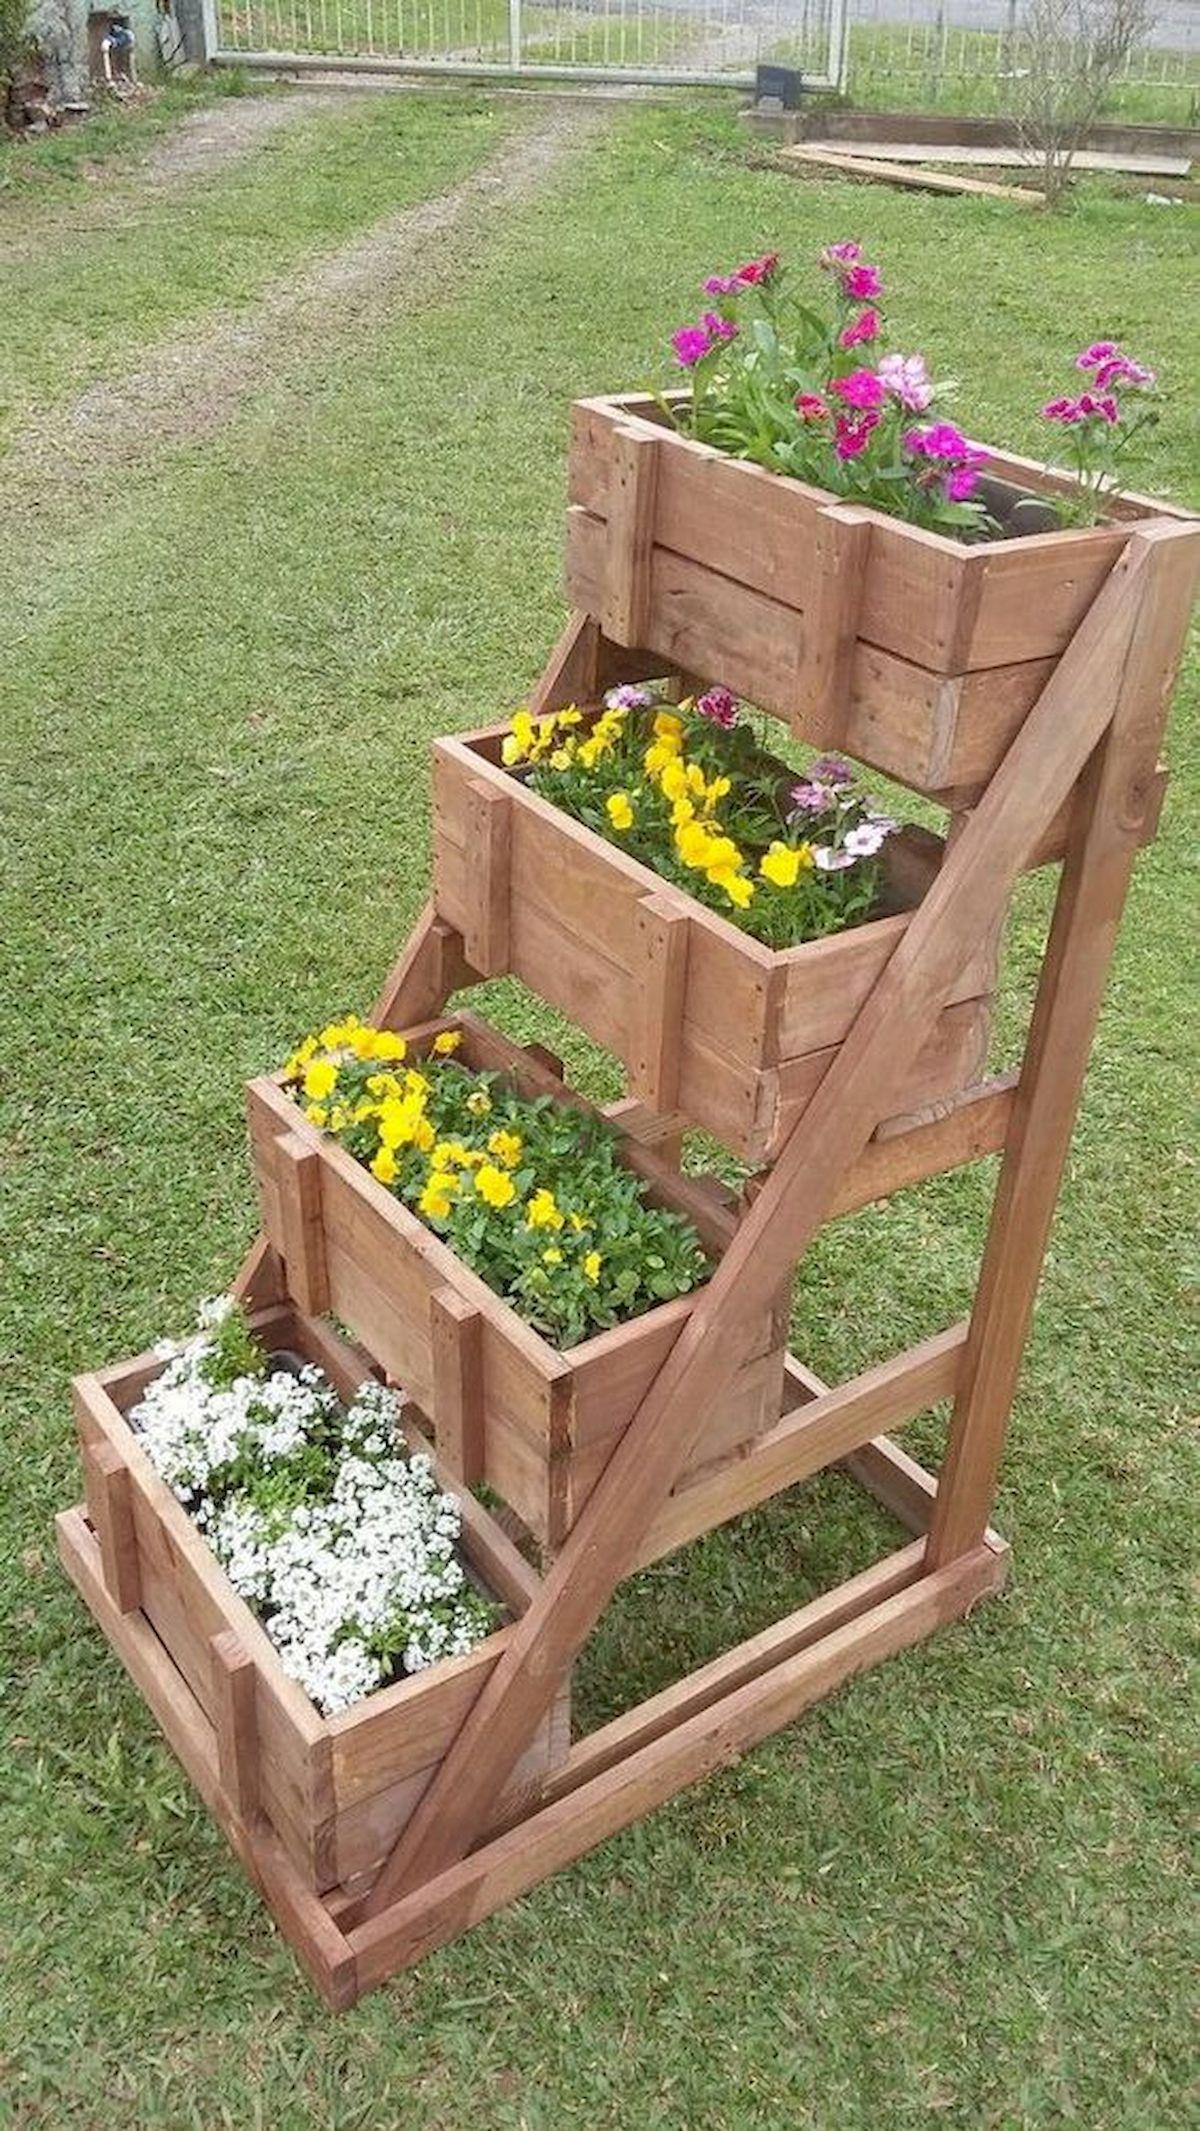 50 Inspiring Diy Projects Pallet Garden Design Ideas Statues And